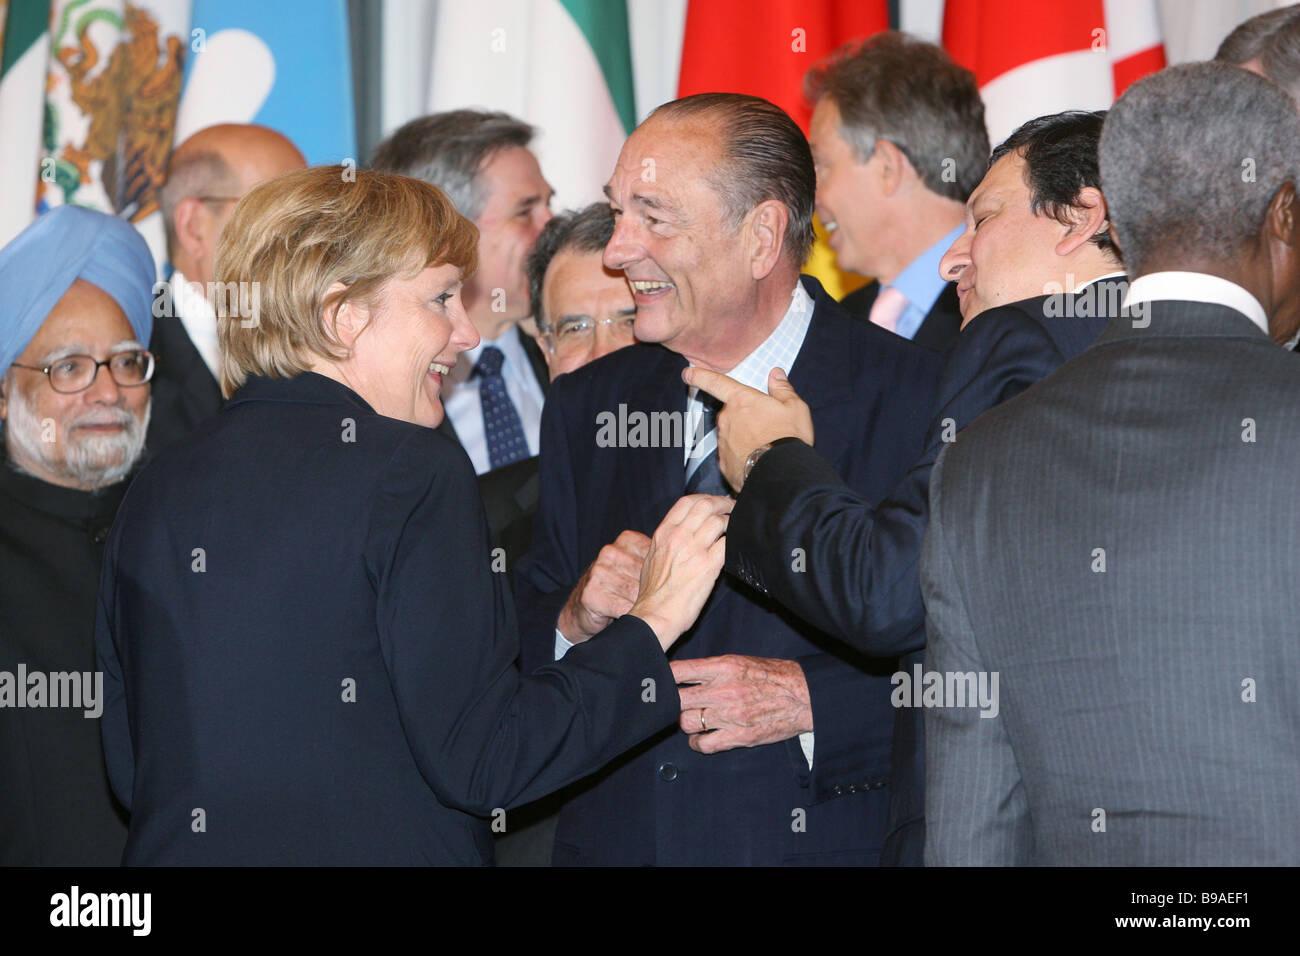 Prime Minister of India Manmohan Singh German Chancellor Angela Merkel President of France Jacques Chirac President - Stock Image